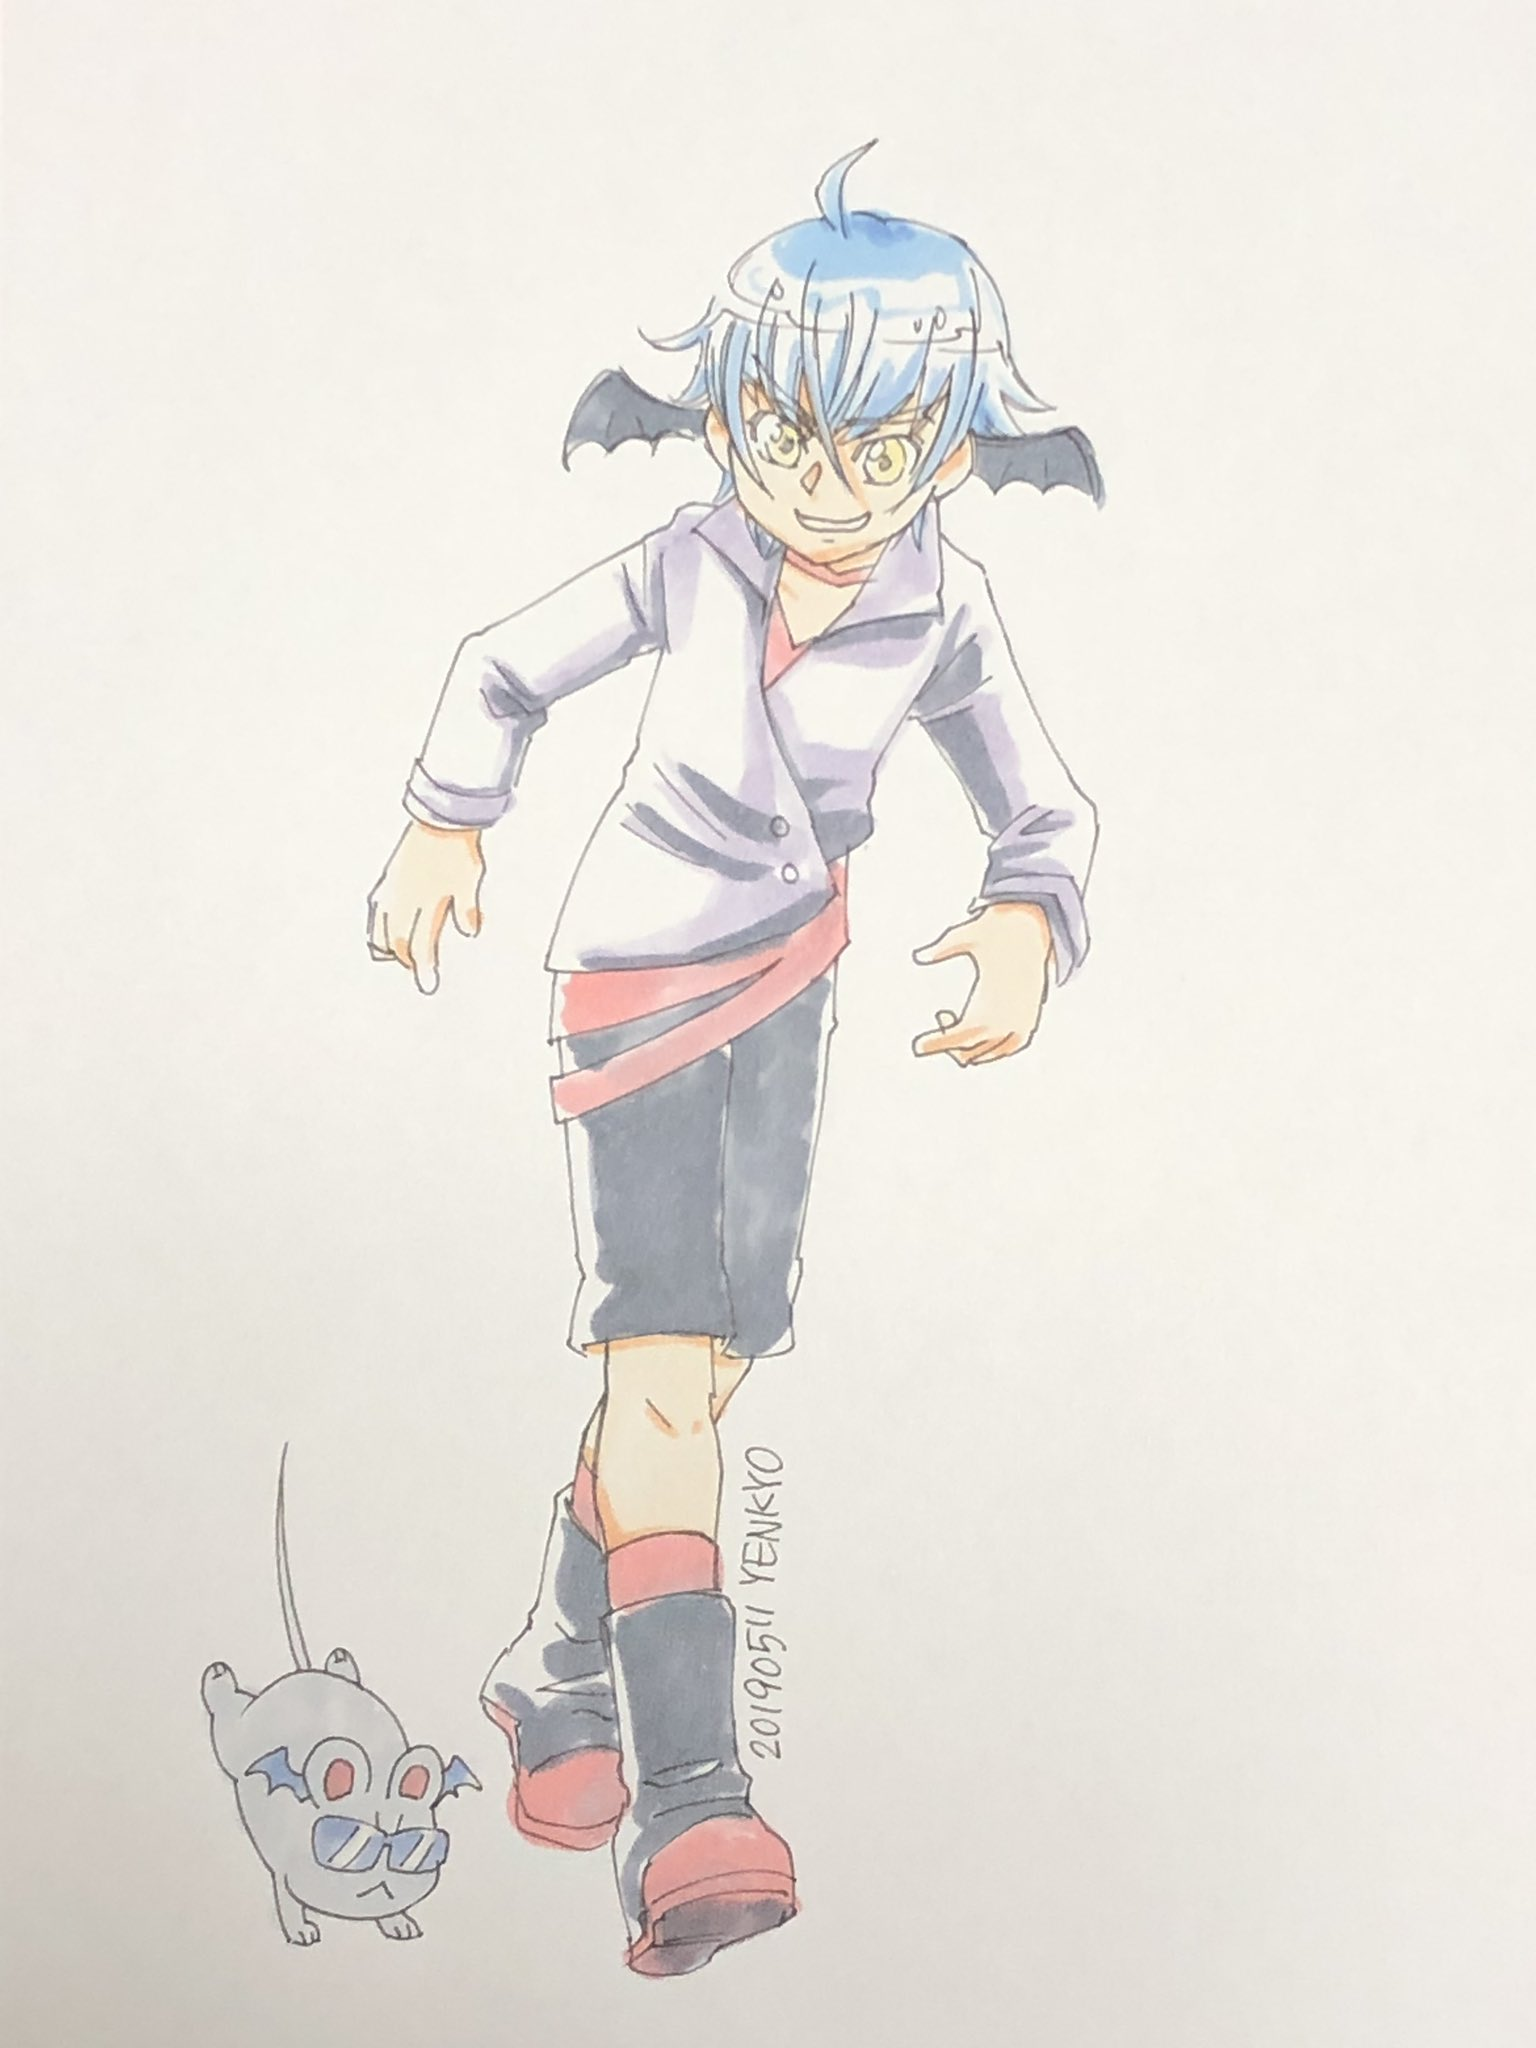 yenkyo📚メロブ通販 (@yenkyo)さんのイラスト